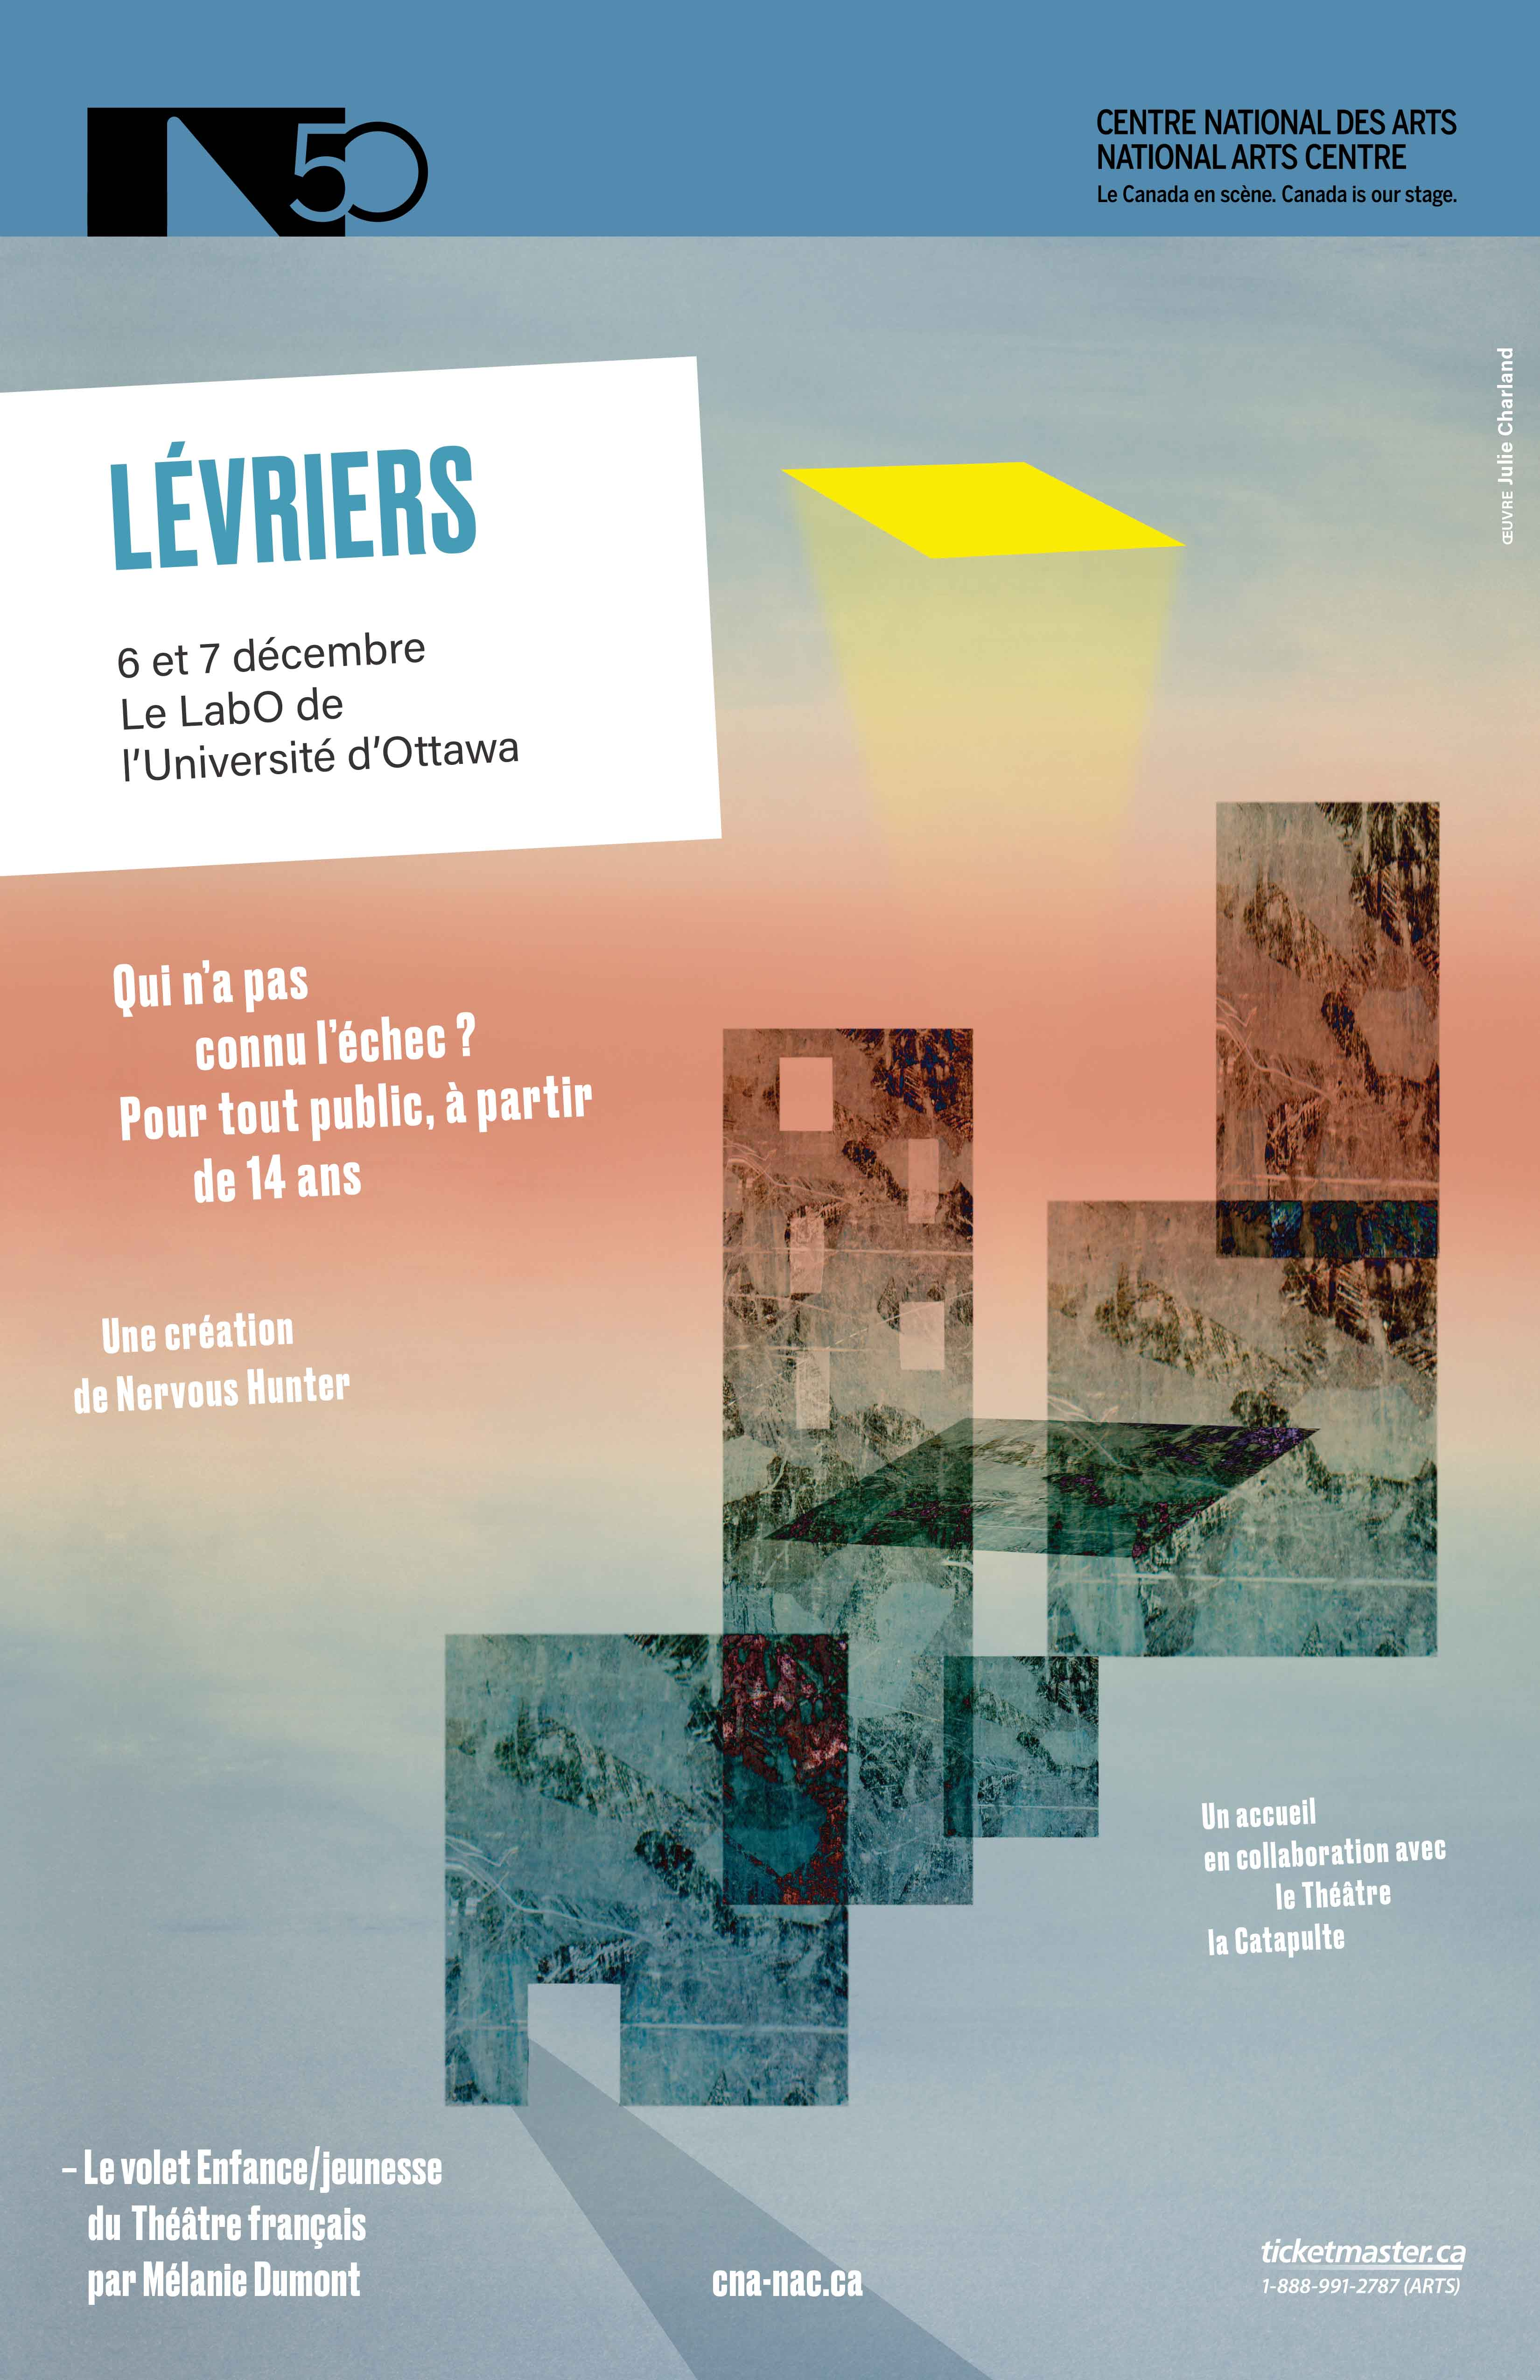 Levrier